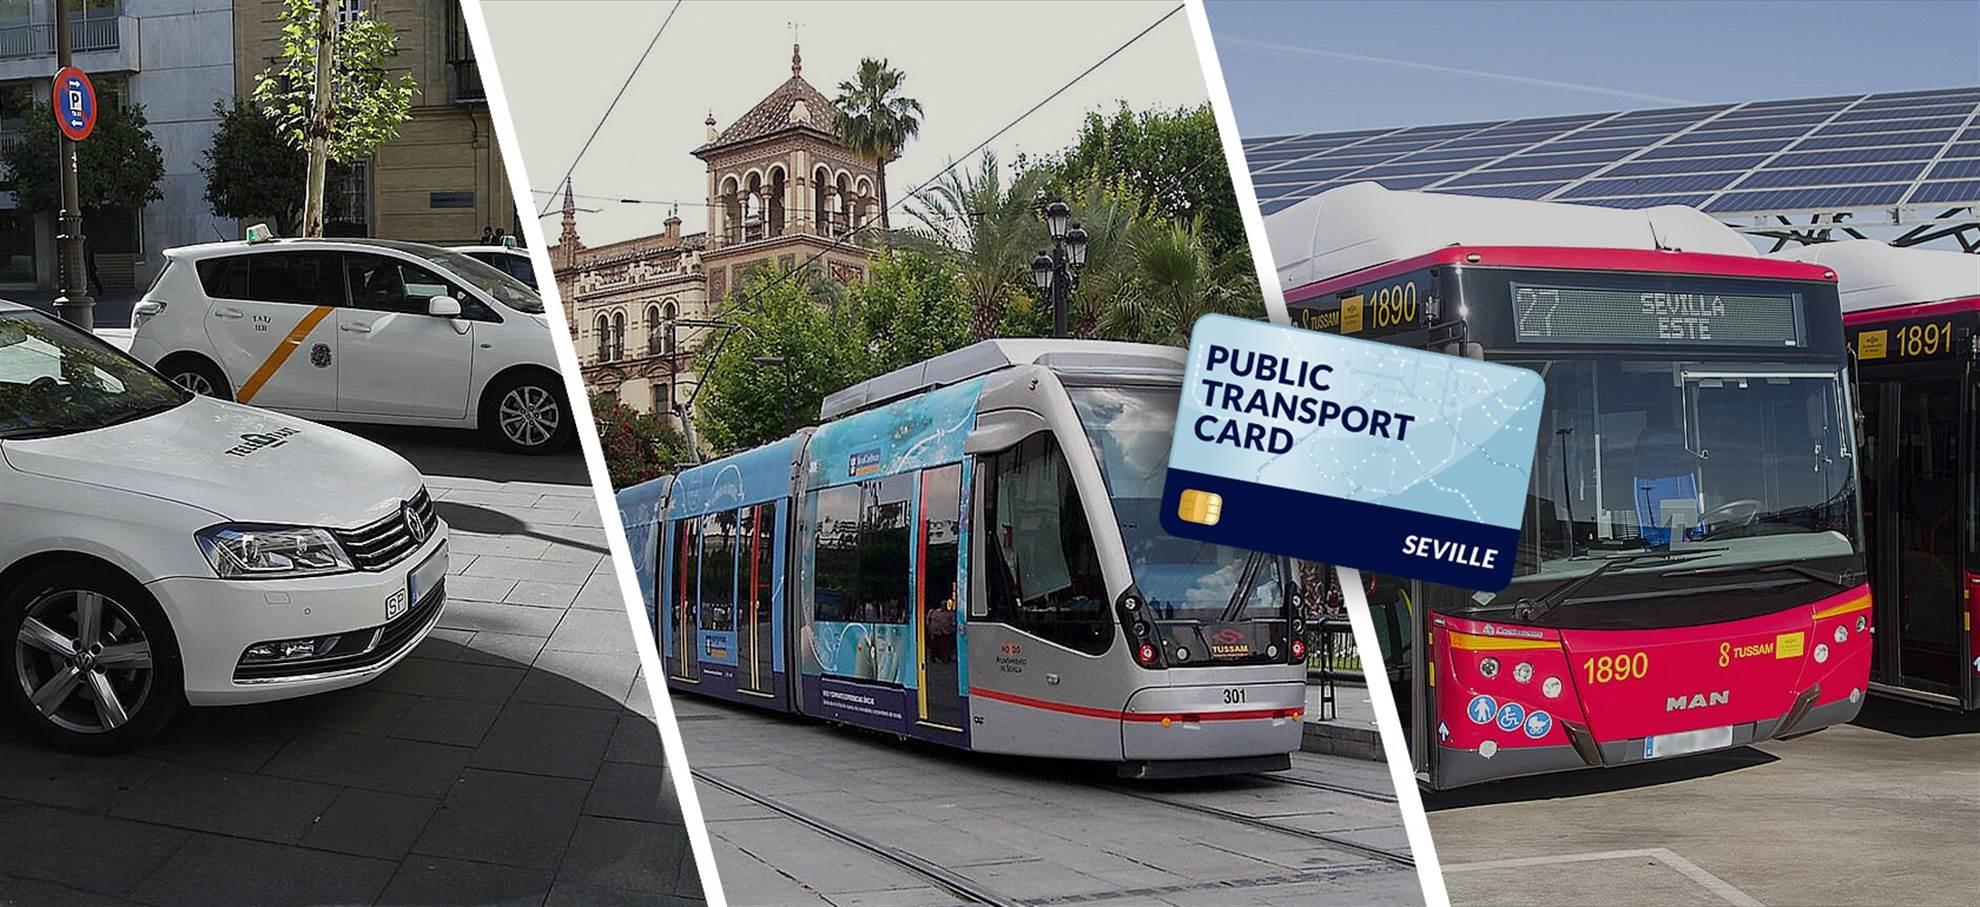 Seville Travel Card